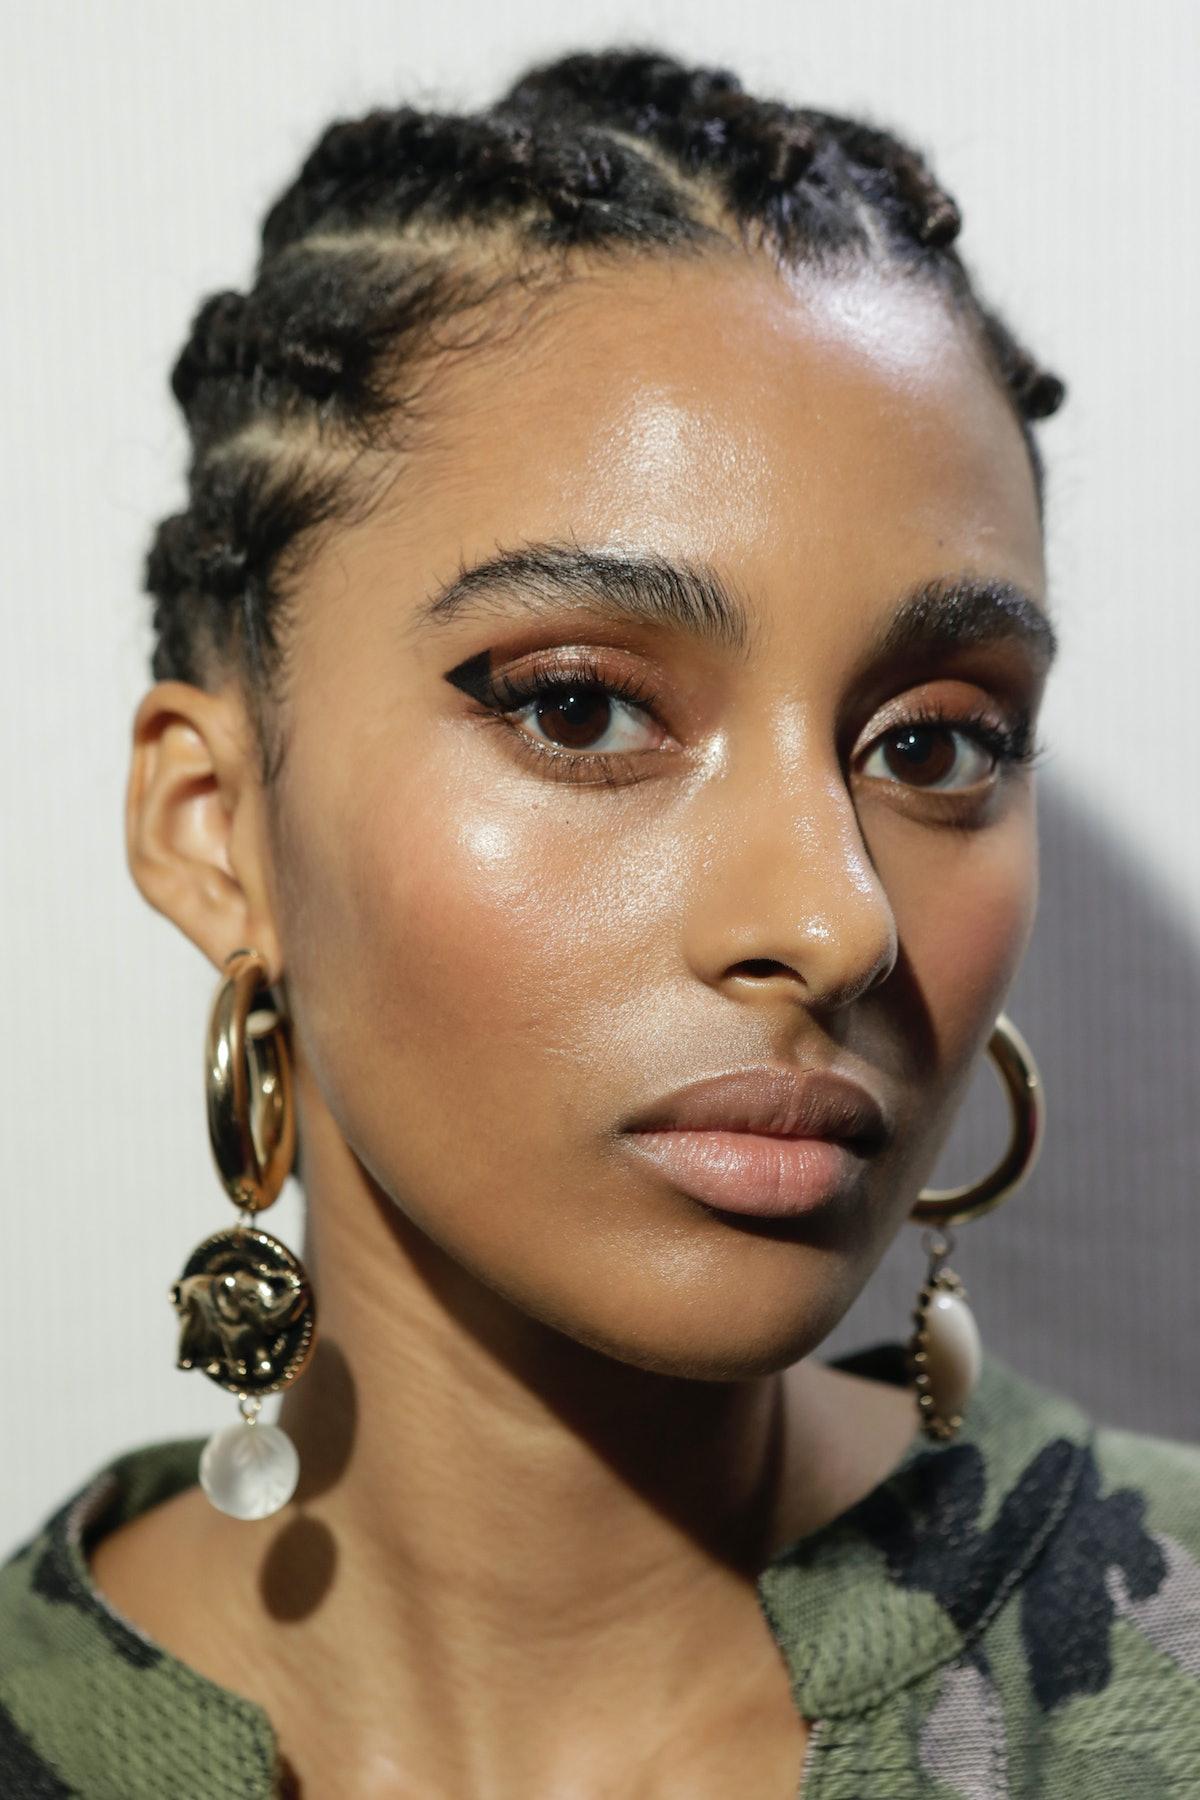 model backstage at fashion week